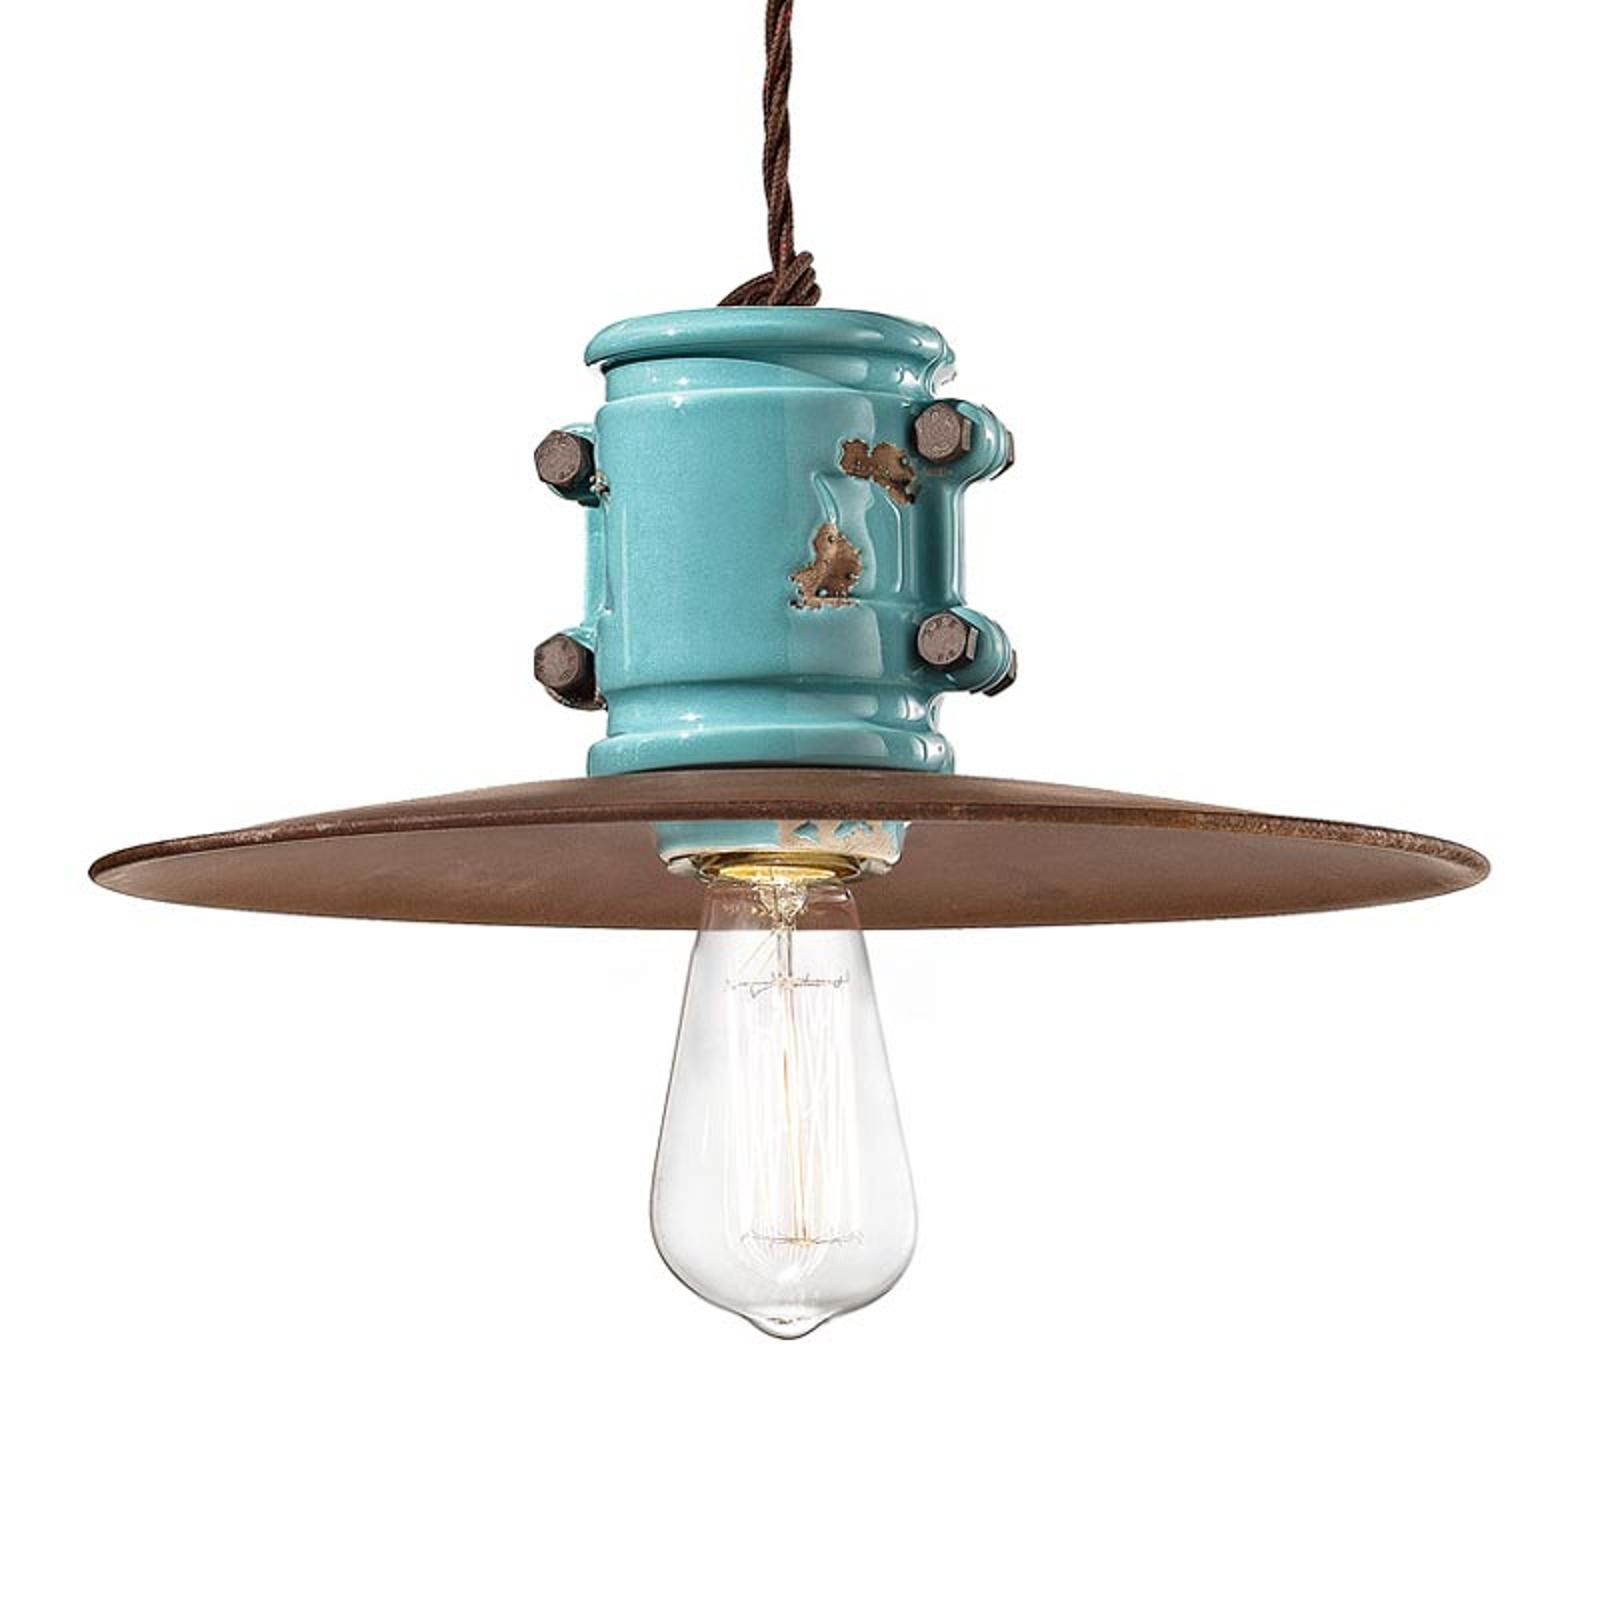 Lampa wisząca Nicolo vintage w kolorze turkusu